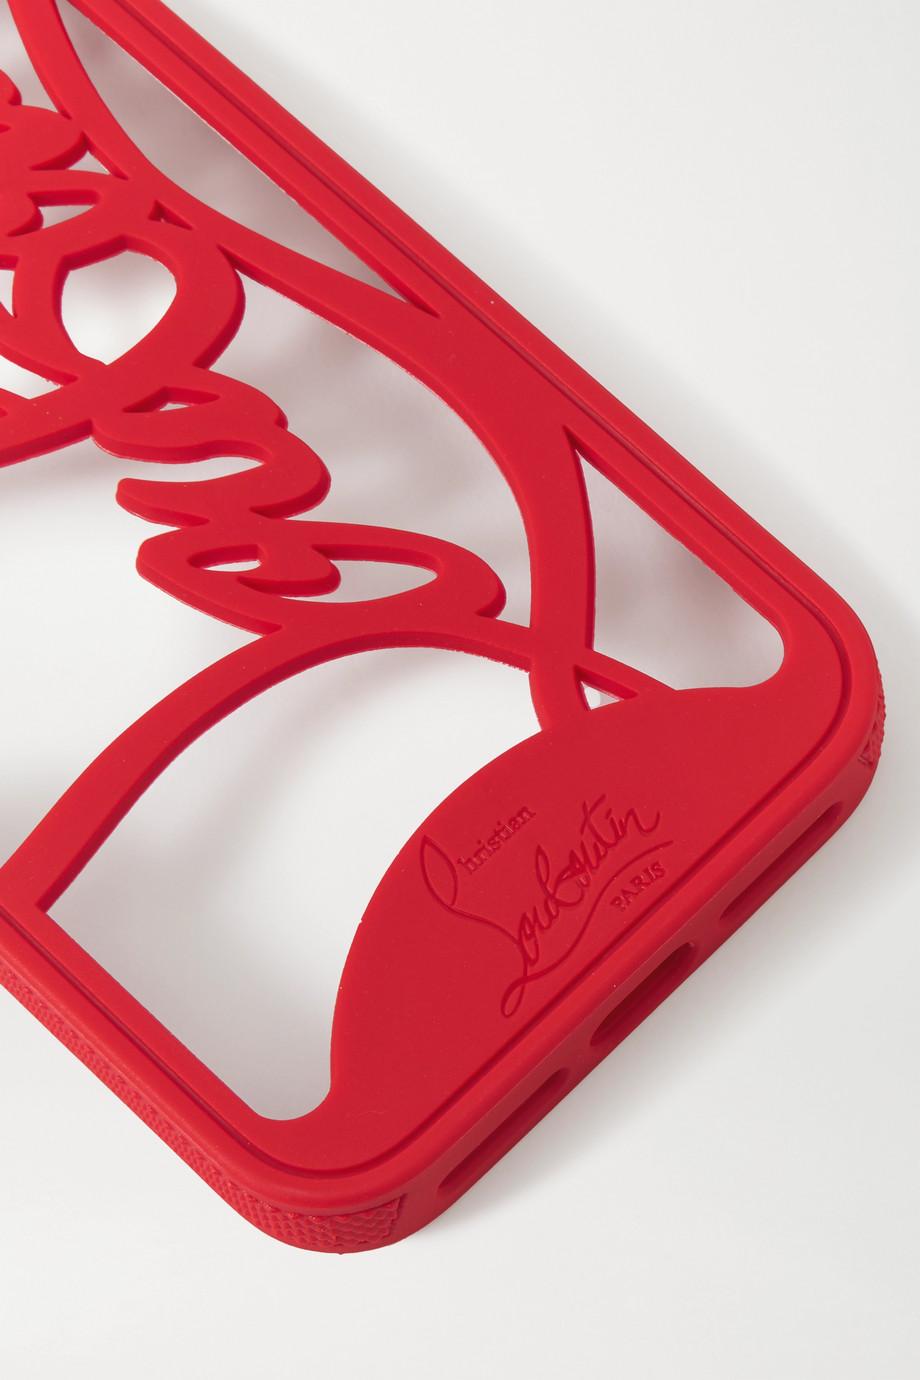 Christian Louboutin Louboutin Logo cutout PVC iPhone 11 Pro case